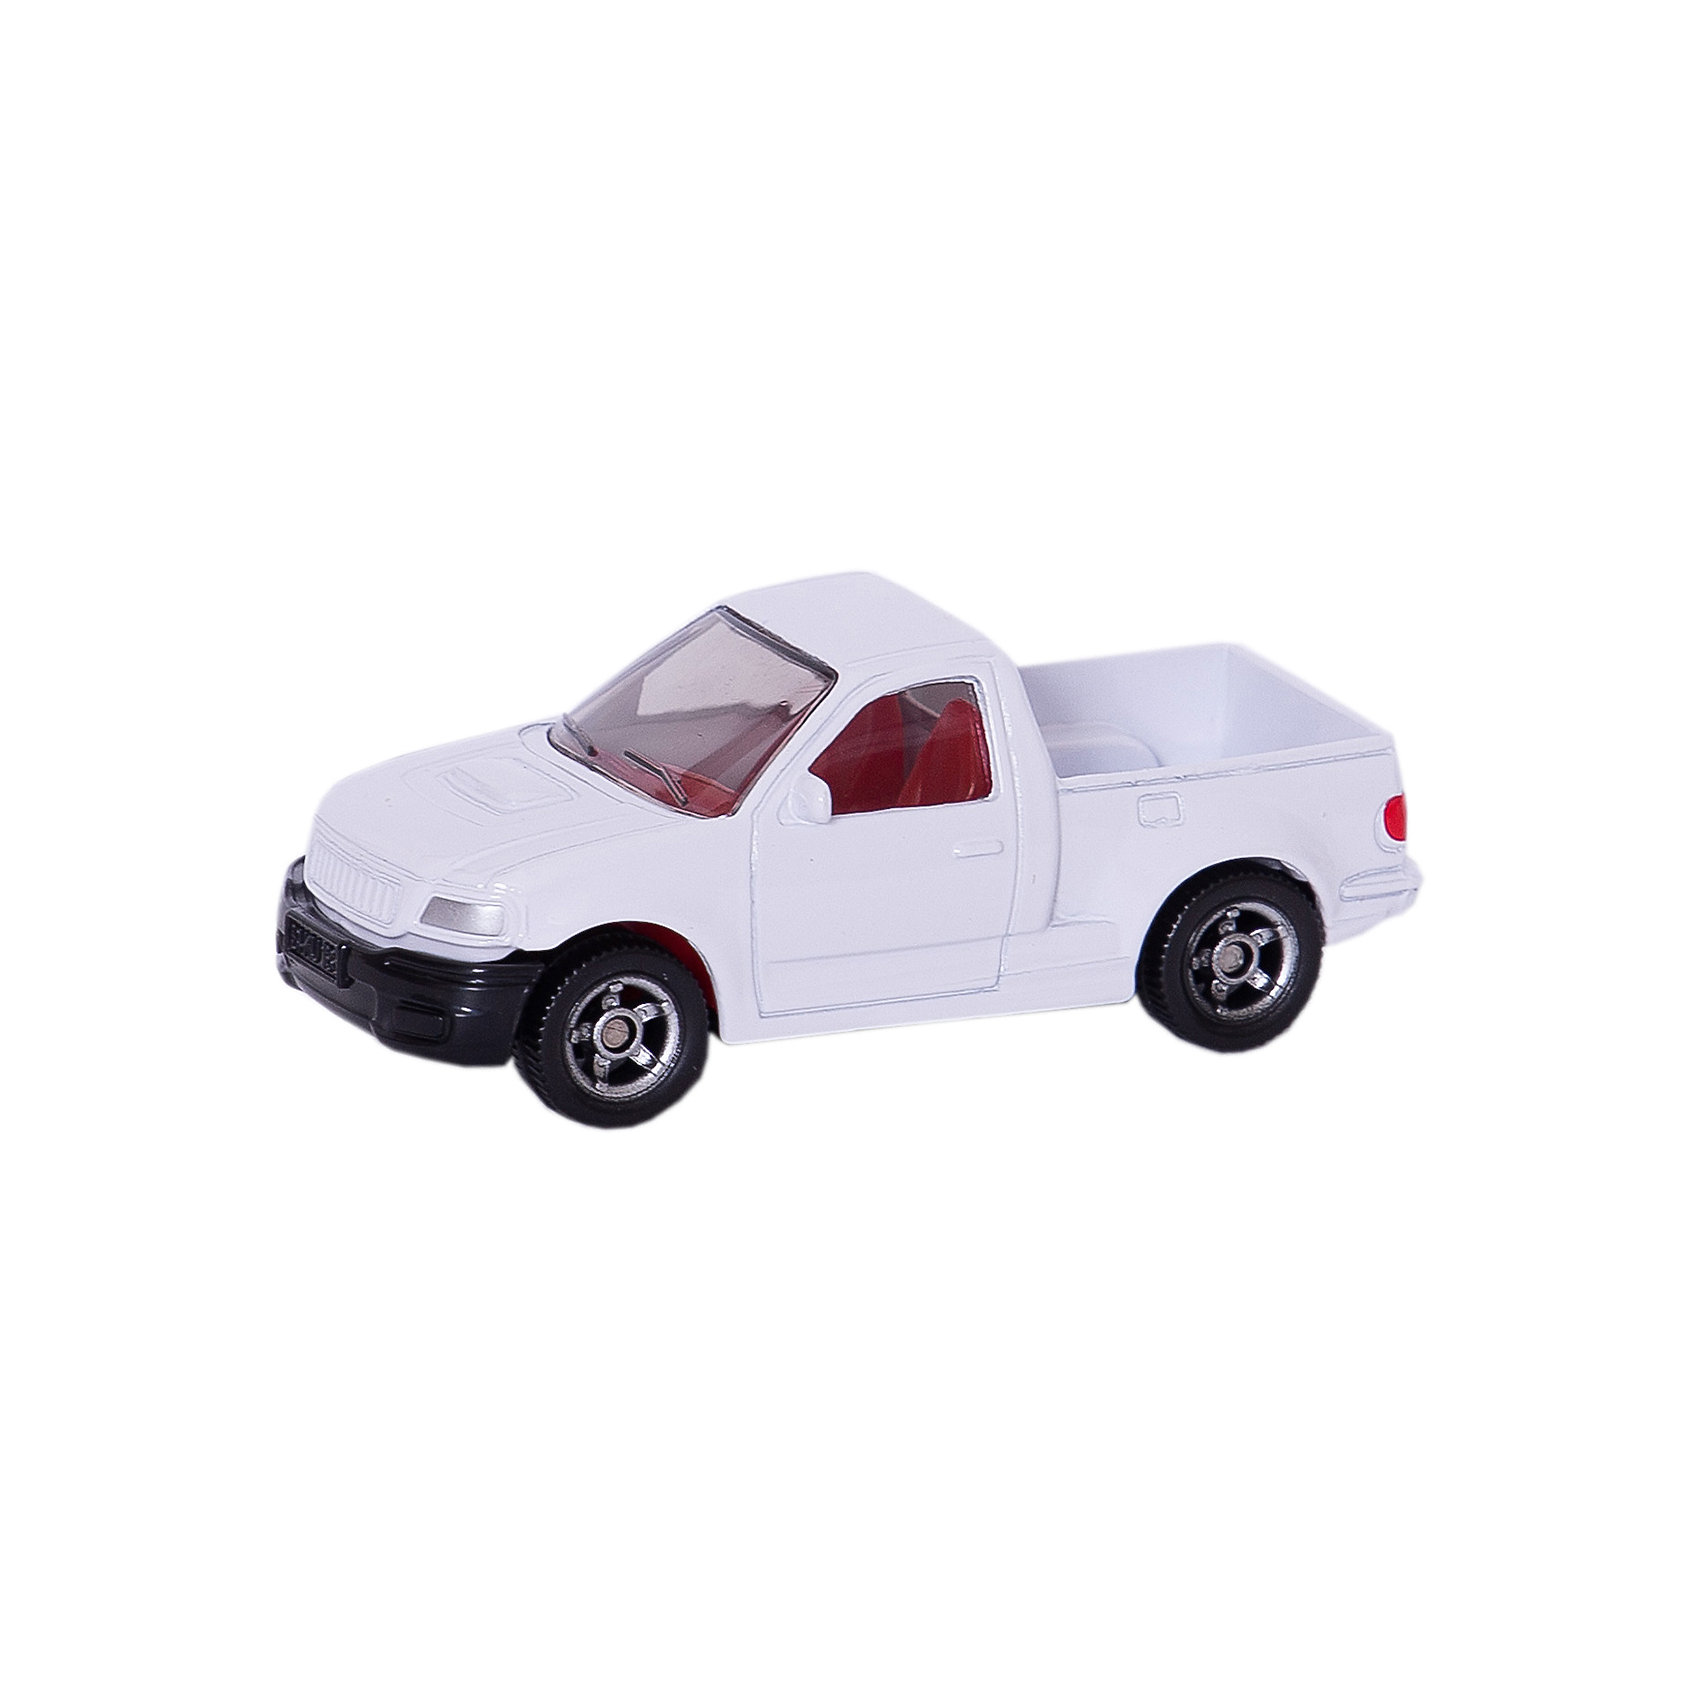 SIKU SIKU 0867 Пикап Ranger 1 1:55 игрушка siku ауди r8 8 0 3 7 2 4см 1430